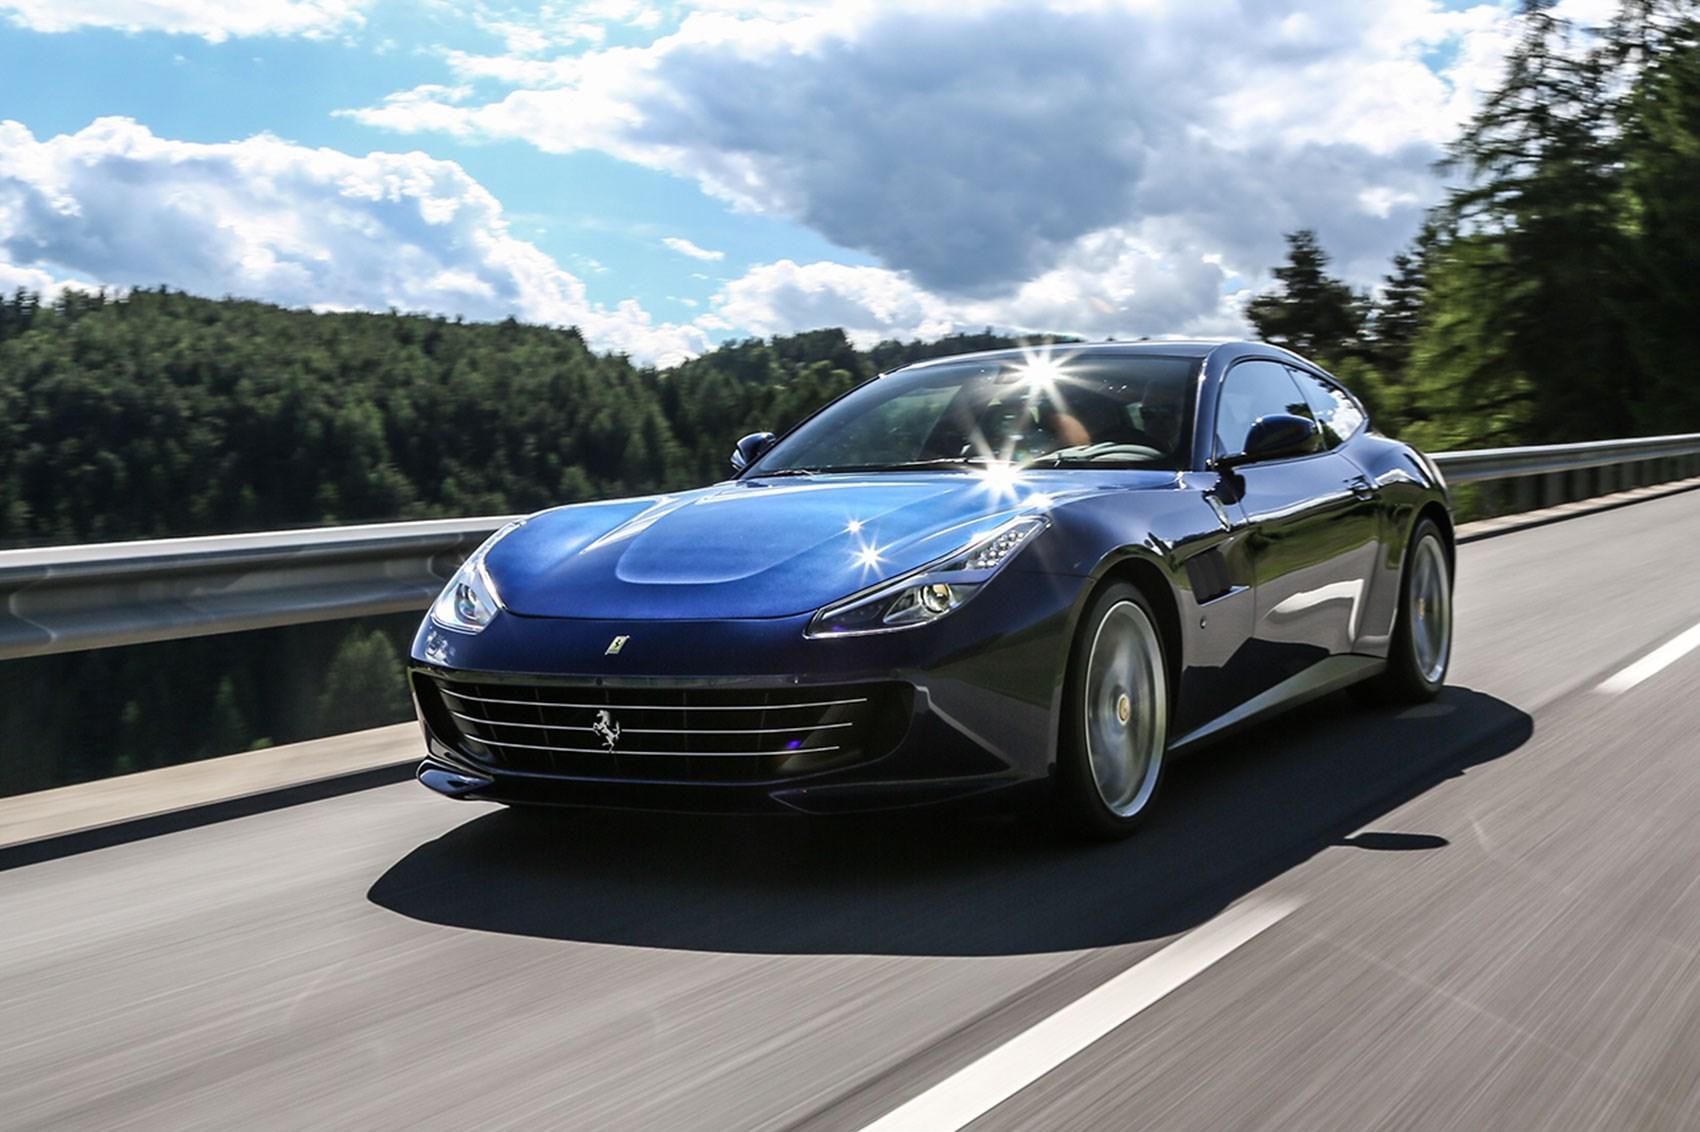 Ferrari Gtc4lusso 2016 Review Car Magazine